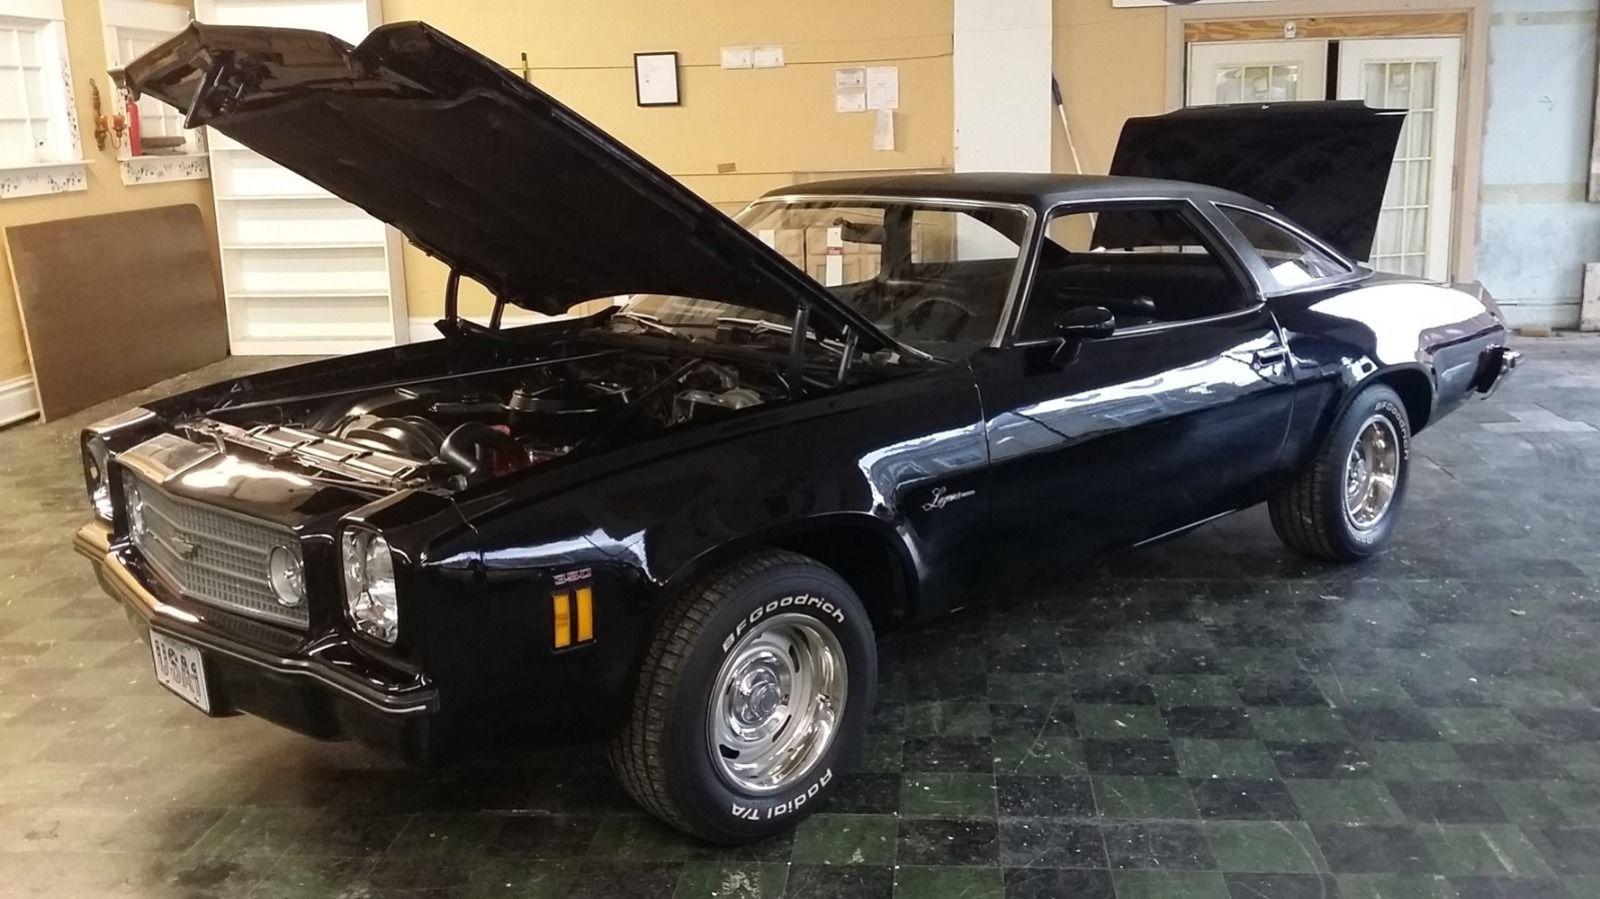 All Chevy 1976 chevy laguna : BangShift.com eBay Find: A 1973 Chevrolet Chevelle Laguna That ...